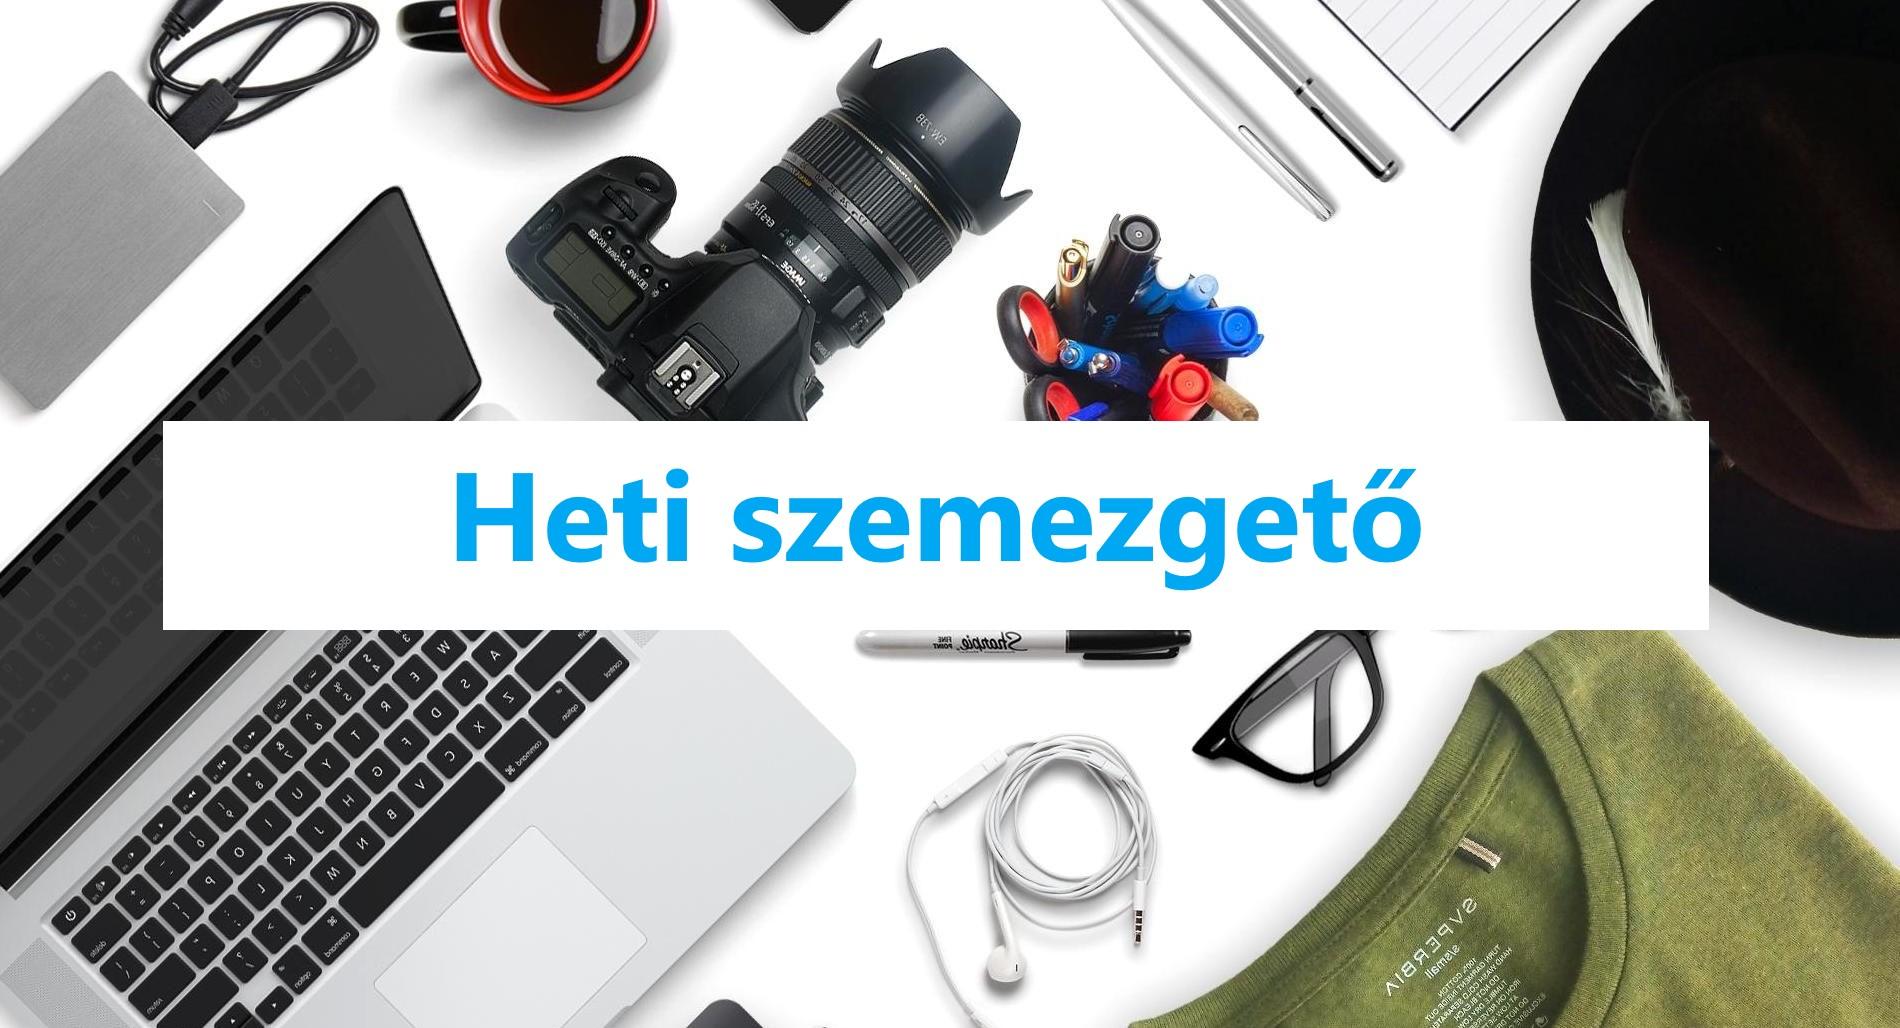 heti_szemezgeto_uj_56.jpg